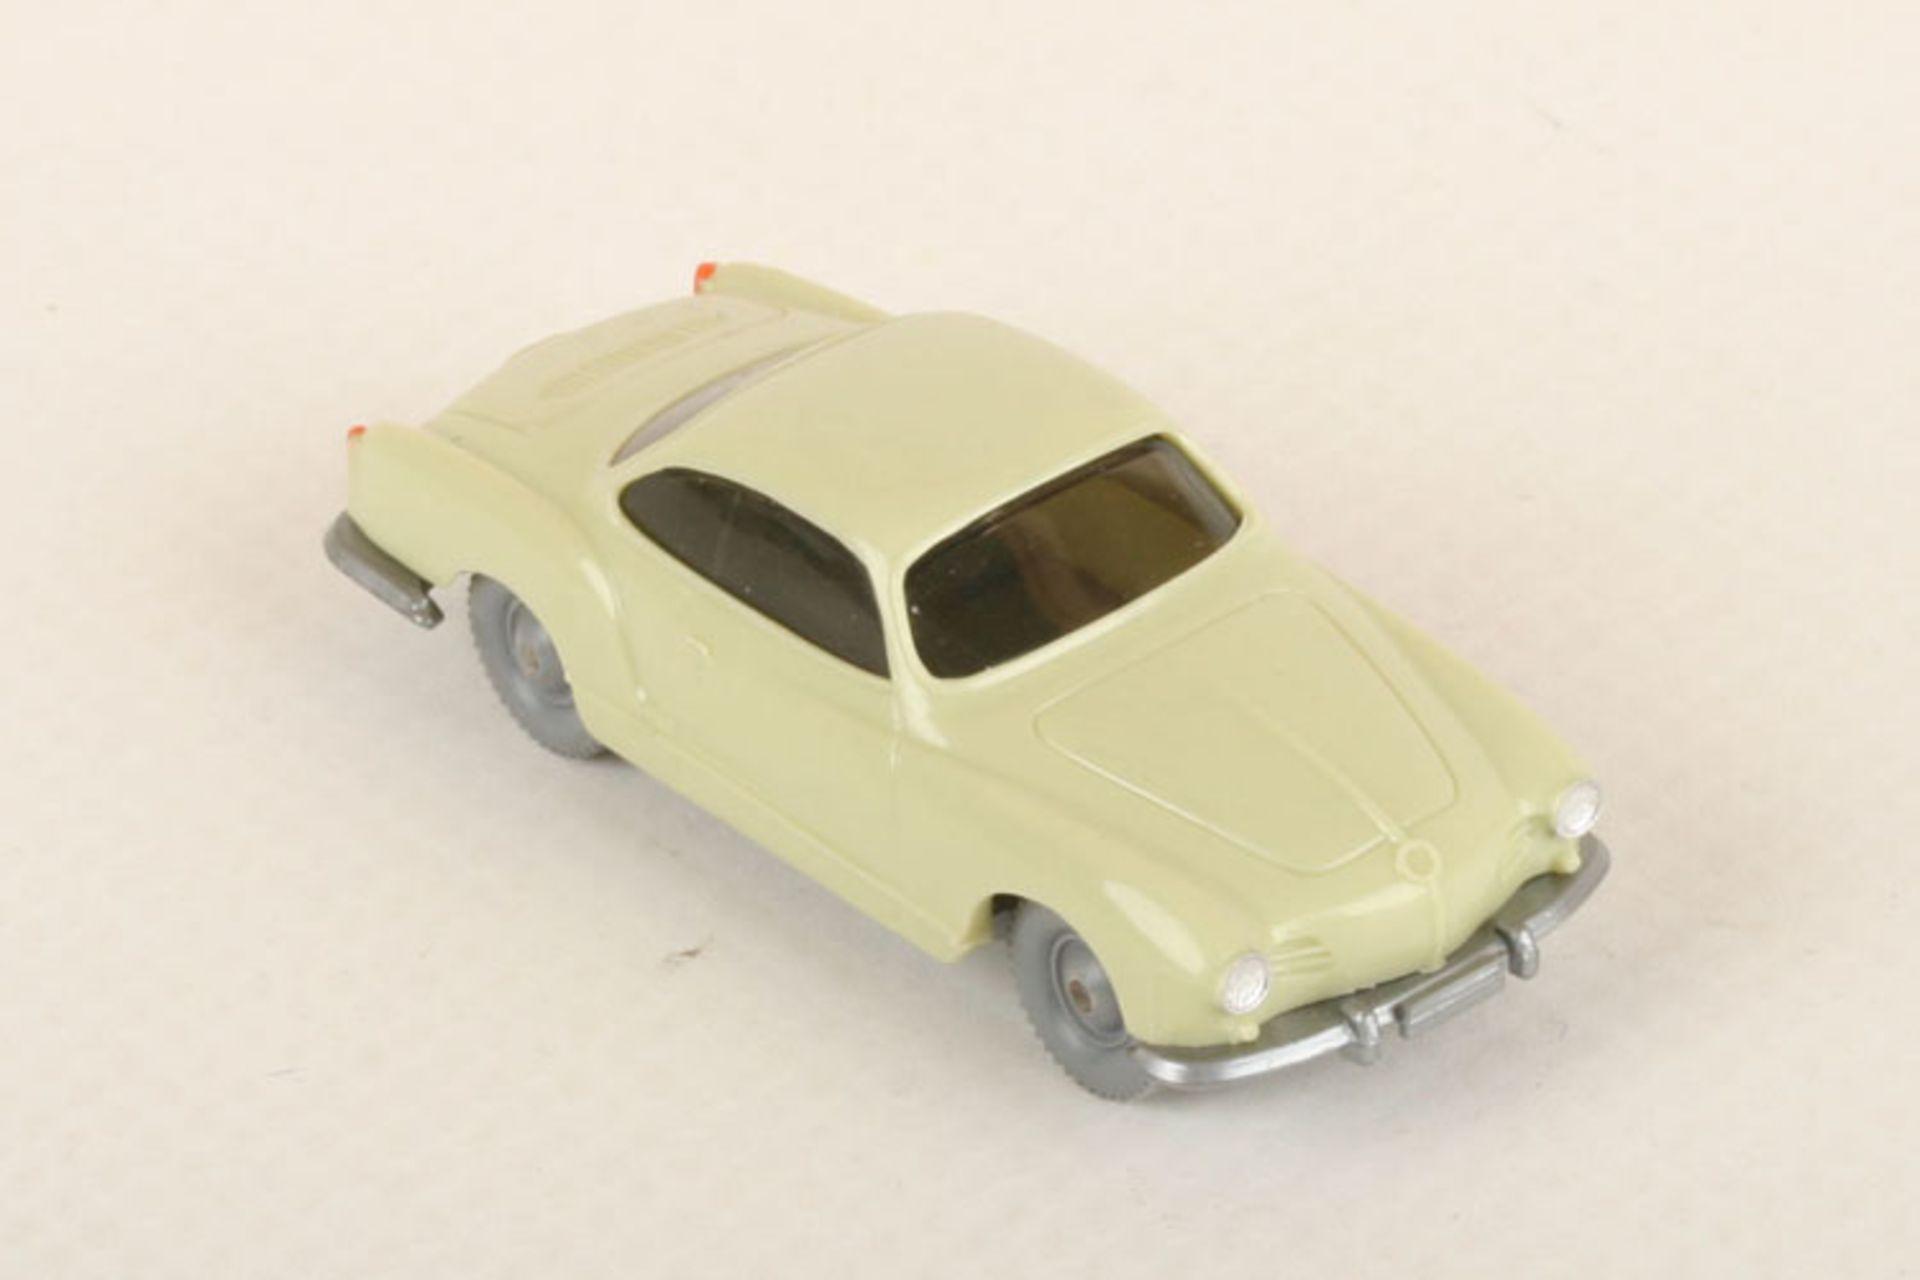 Los 1028 - Wiking VW Karmann Ghia h'grünbeige 34/4d, neuwertig